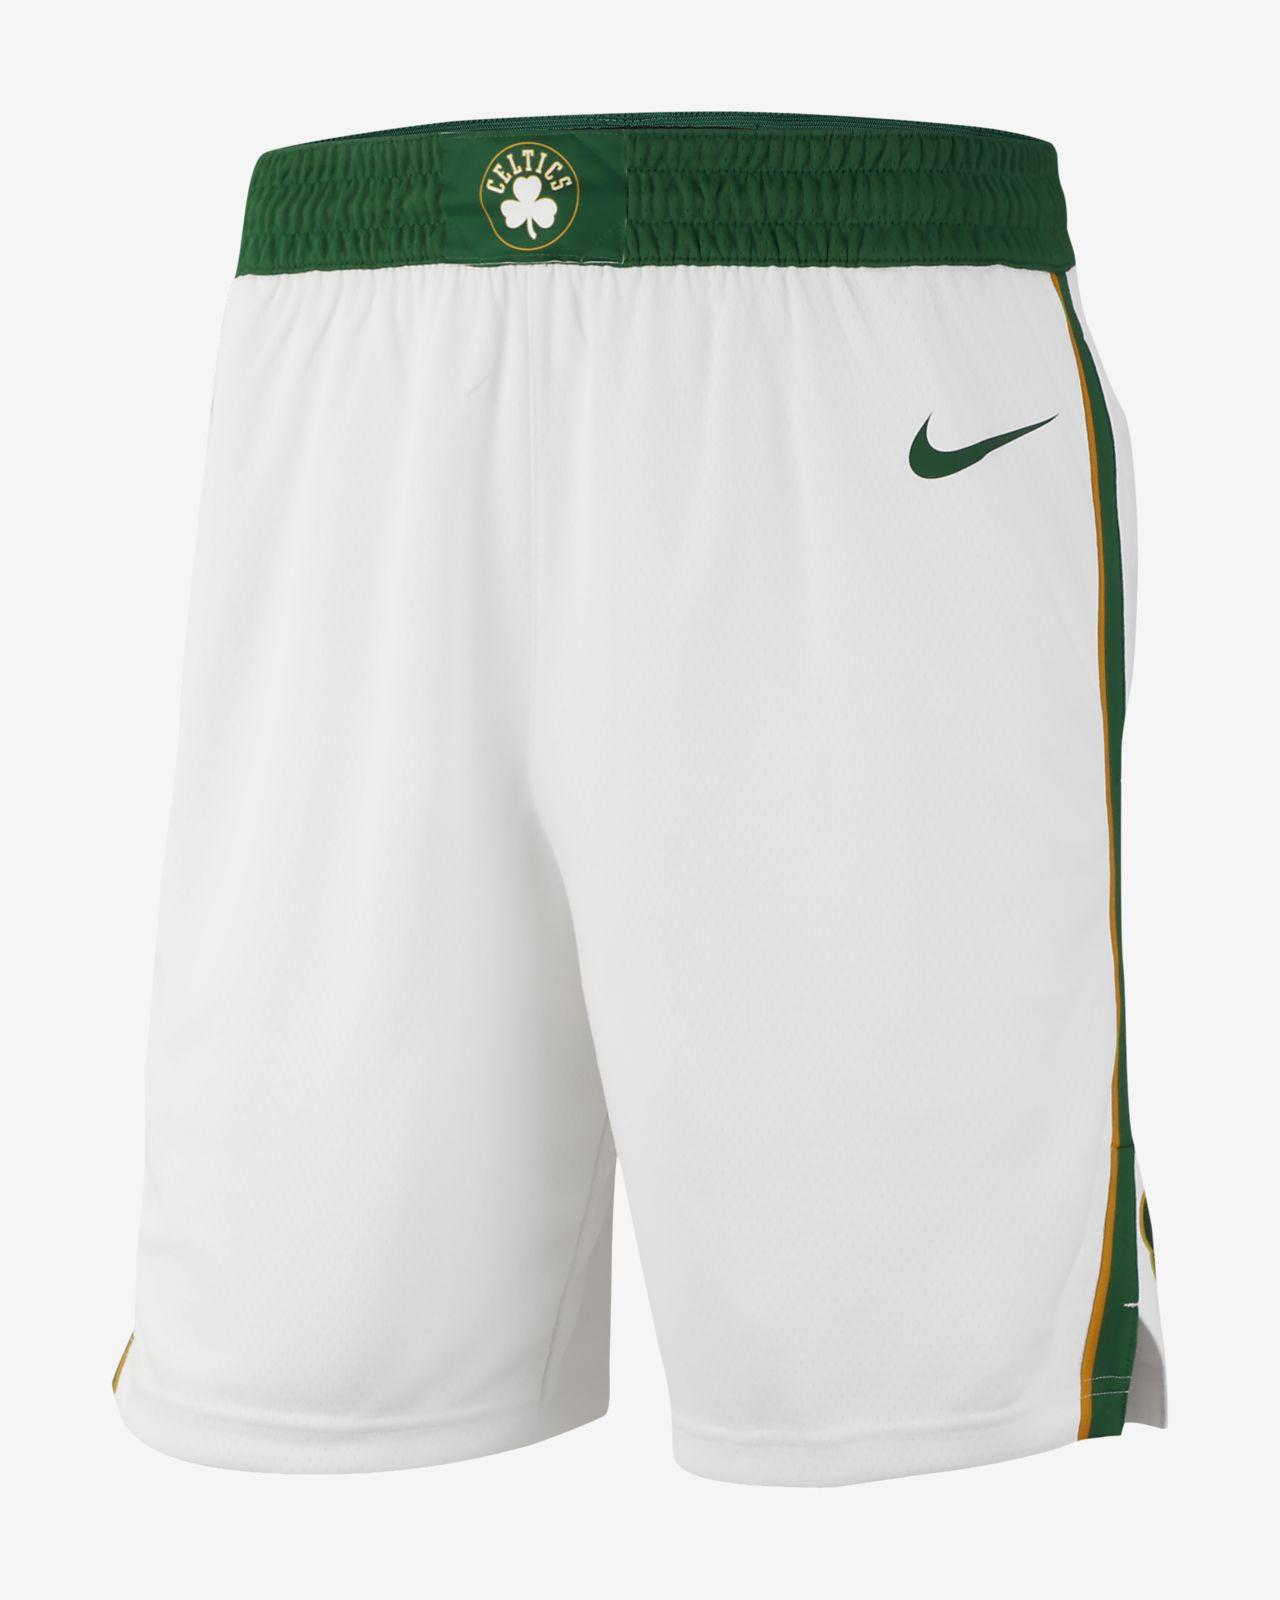 size 40 a67f2 c7f91 ... Boston Celtics City Edition Swingman Pantalón corto de la NBA Nike -  Hombre